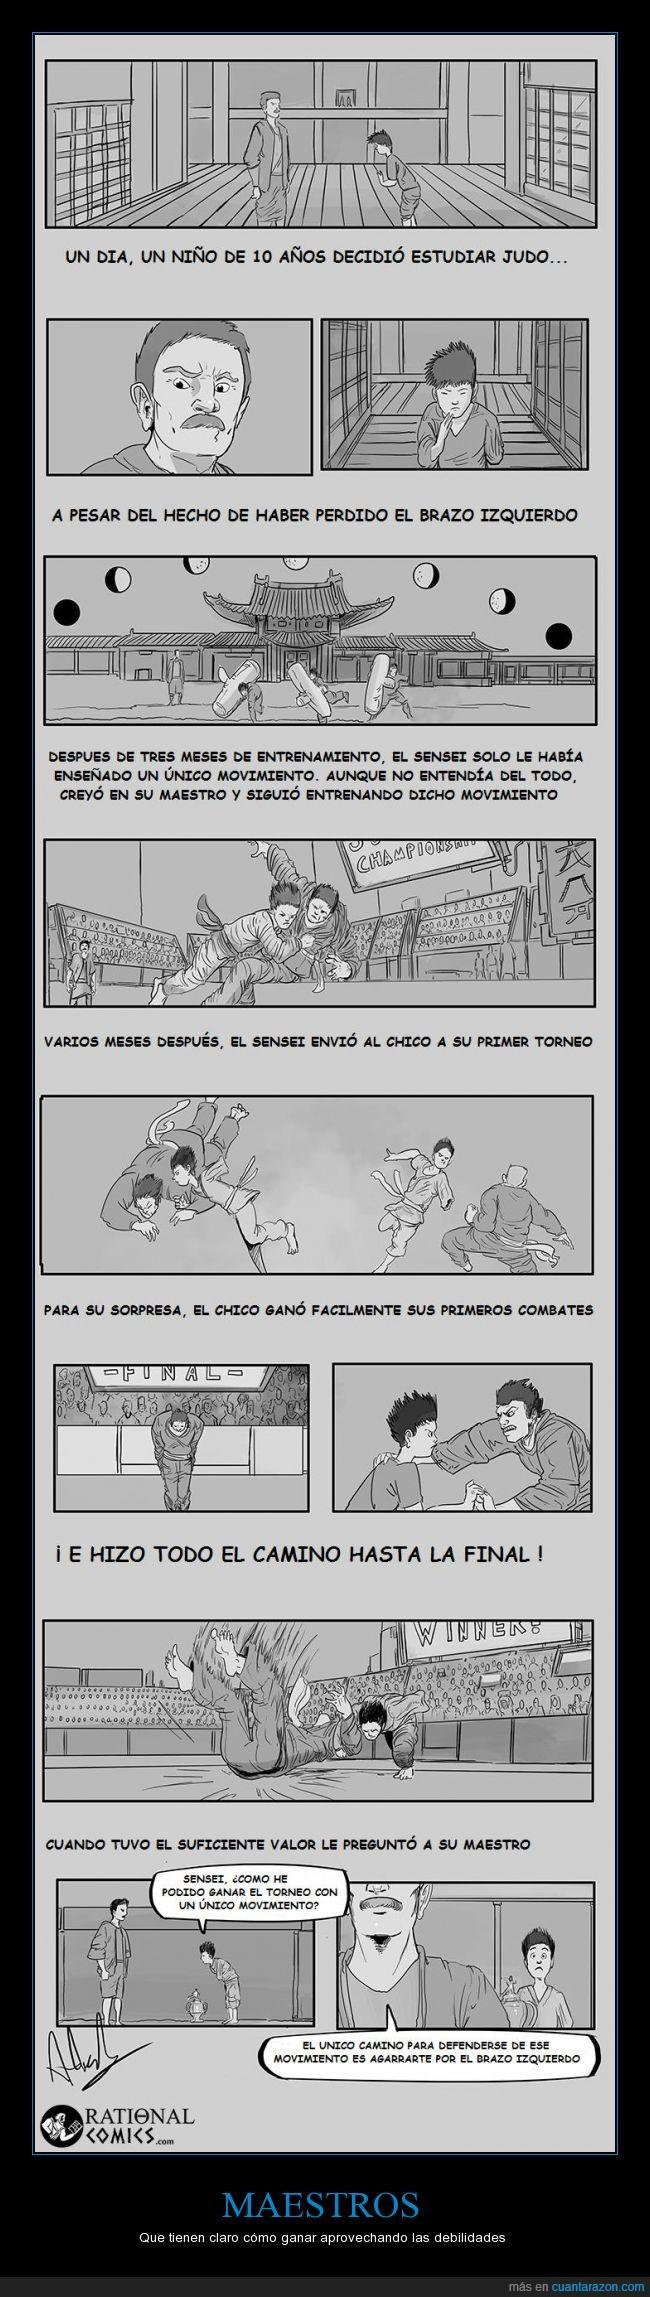 agarrar,brazo,coger,defender,ganar,izquierdo,judo,maestro,perder,sensei